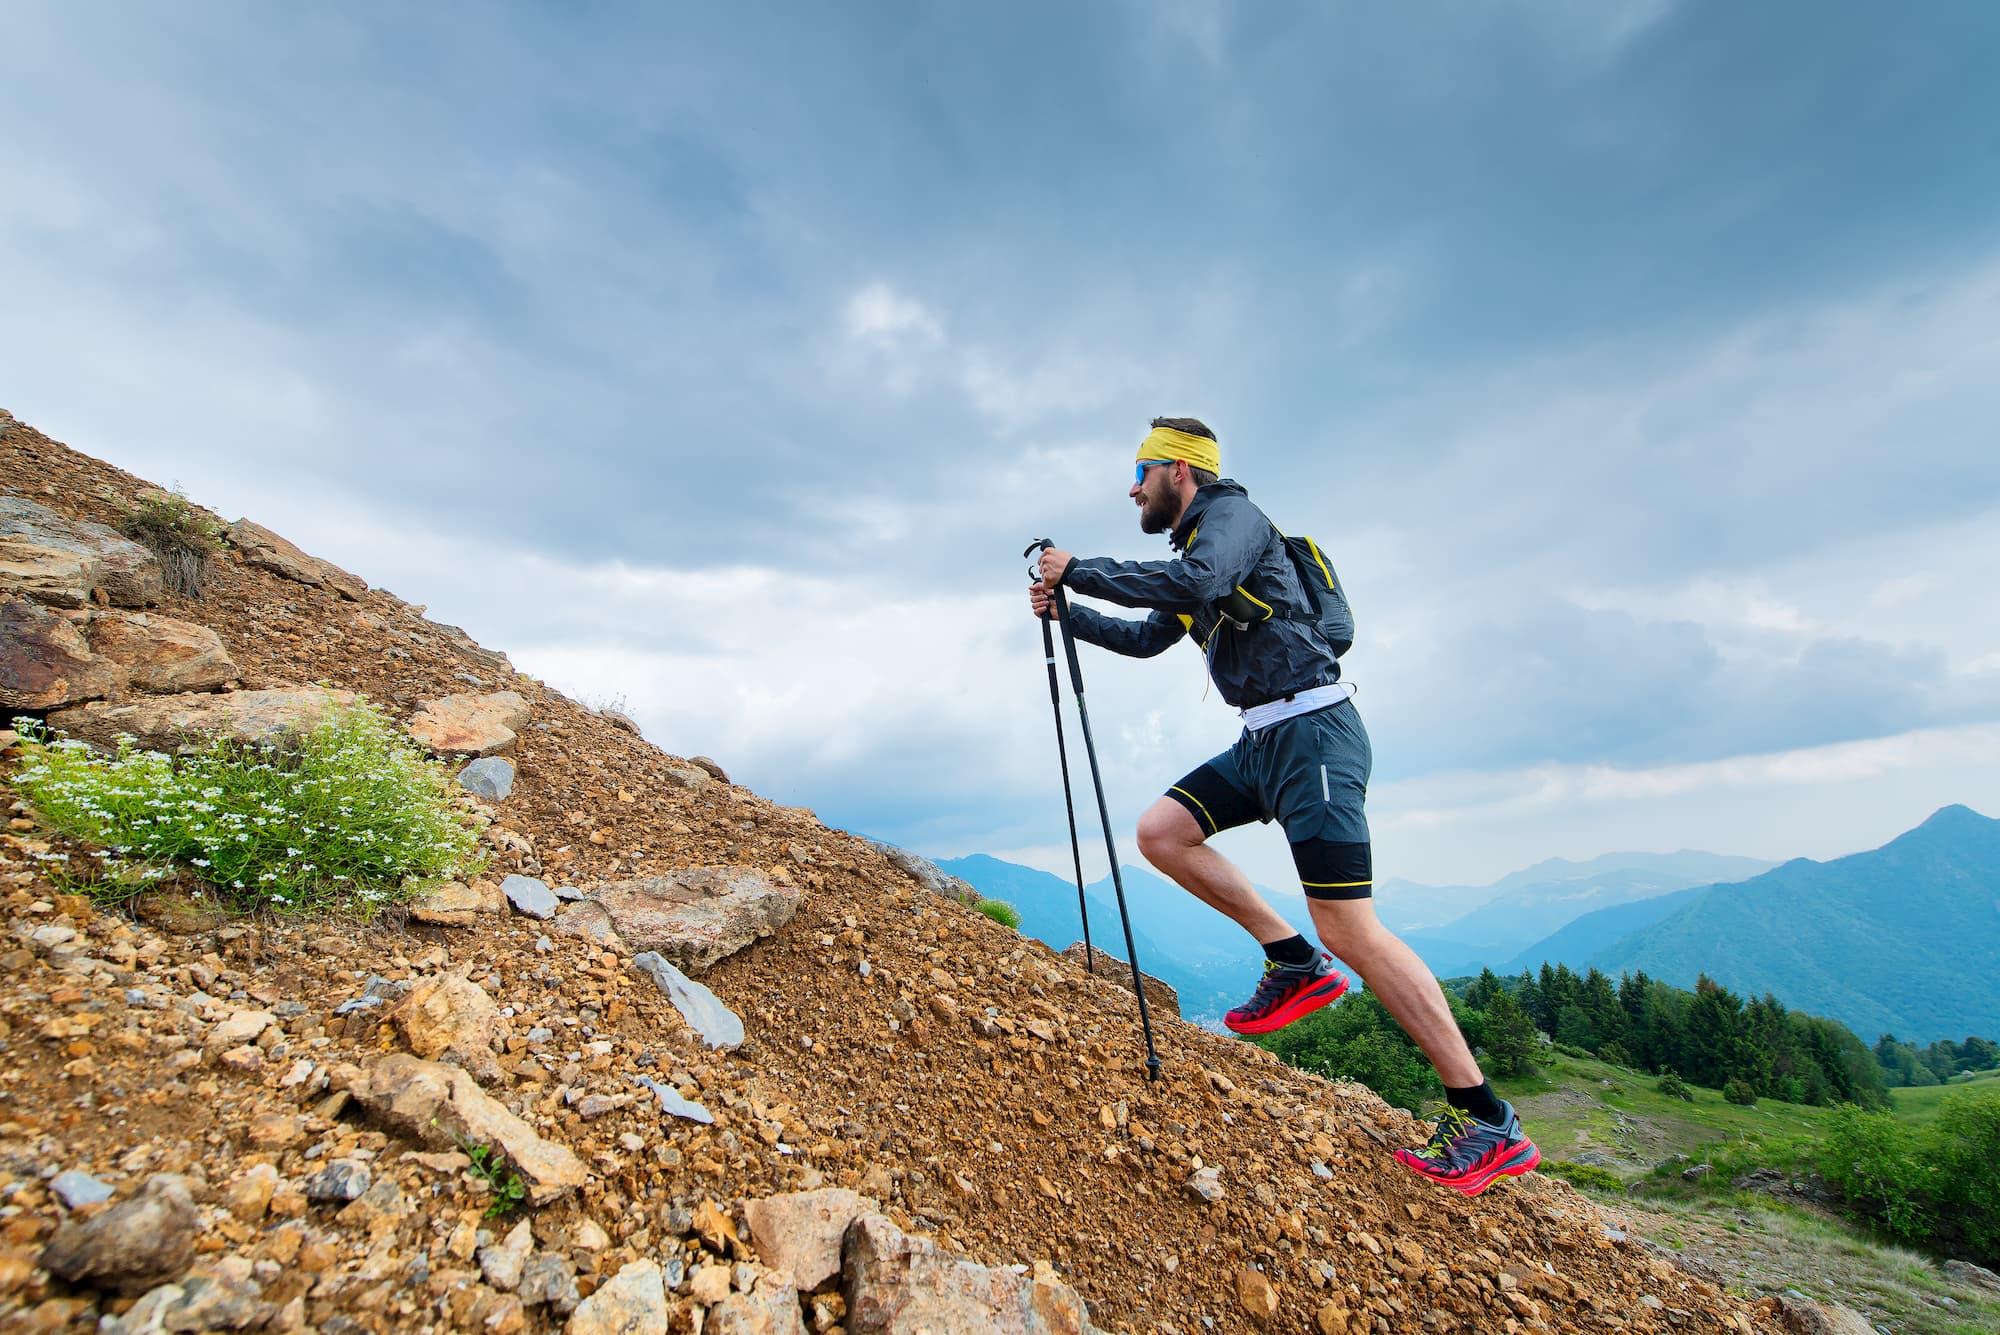 Man hiking uphill with trekking poles.